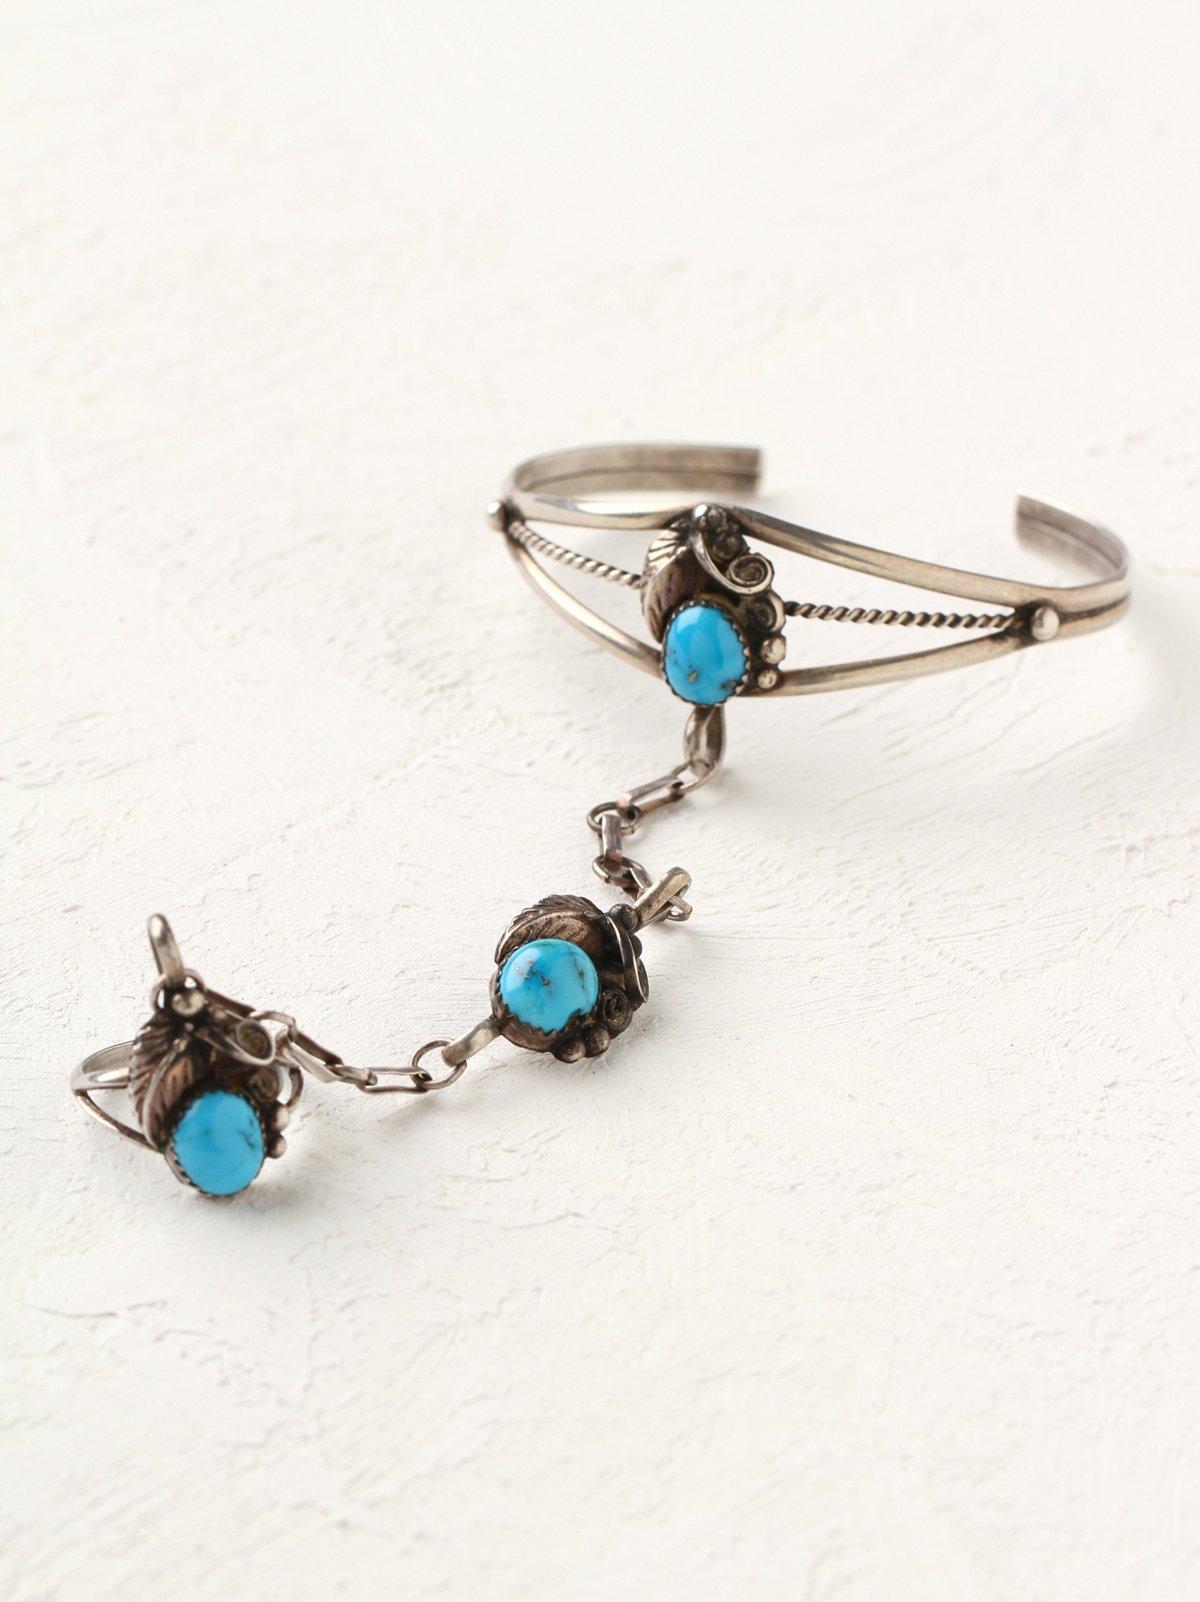 Vintage Turquoise Charm Ring Bracelet